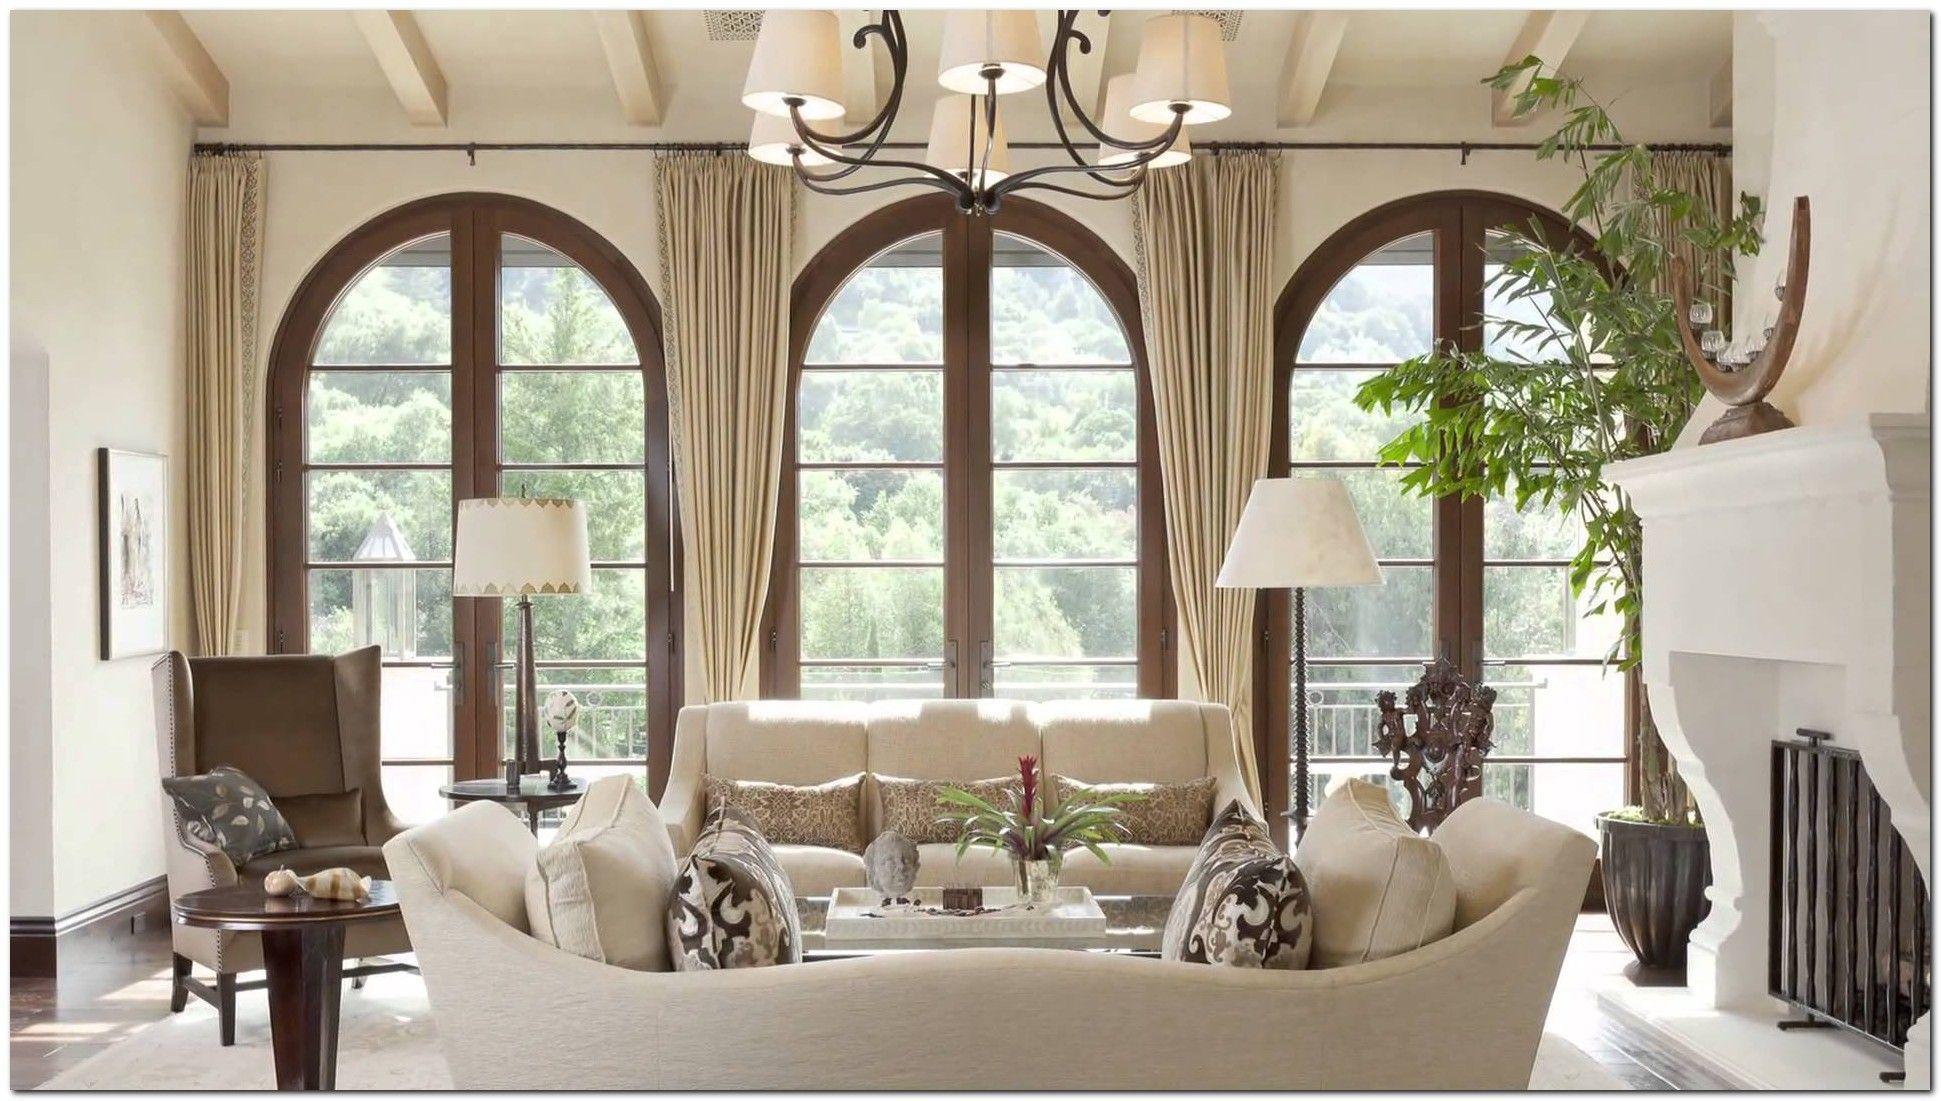 50+ Classy Modern Mediterranean Decor Ideas #Interiordecorstylesclassy